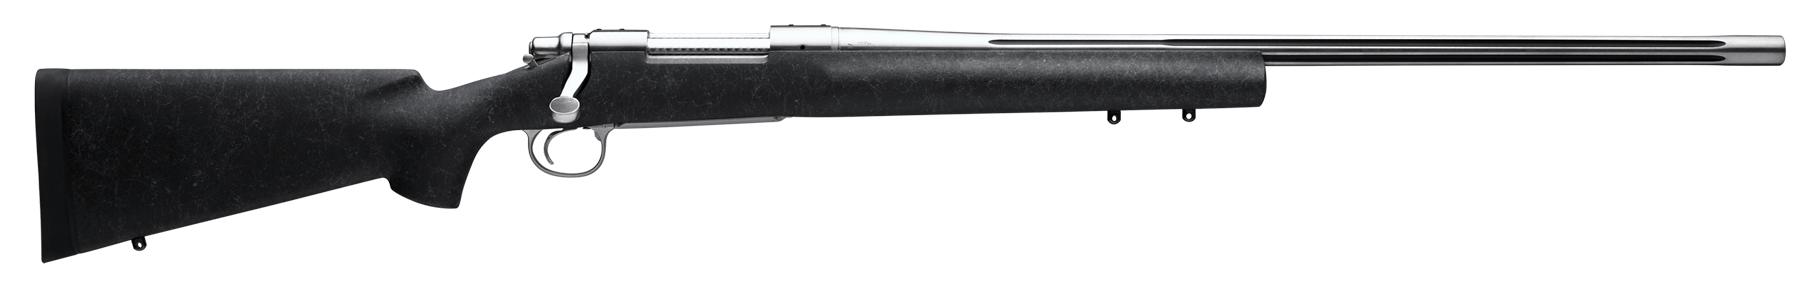 Remington  700 Sendero-img-1